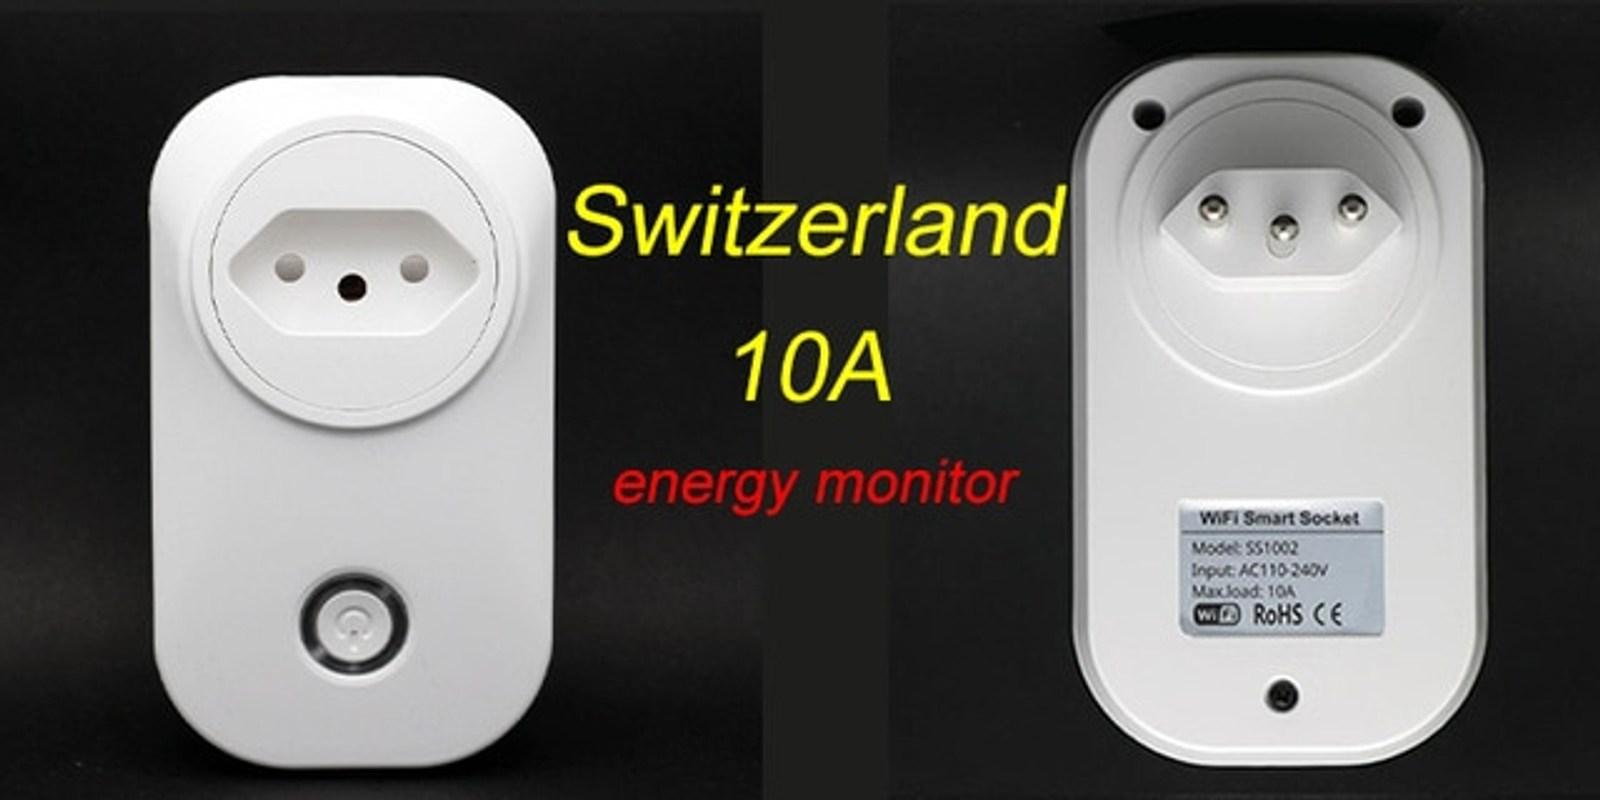 Tuya WIFI 스마트 소켓 스마트 플러그 EU 영국 Swit AU BR FR JP, 협력사, 스마트 라이프 투야, 스위스 플러그 (POP 5587759880)